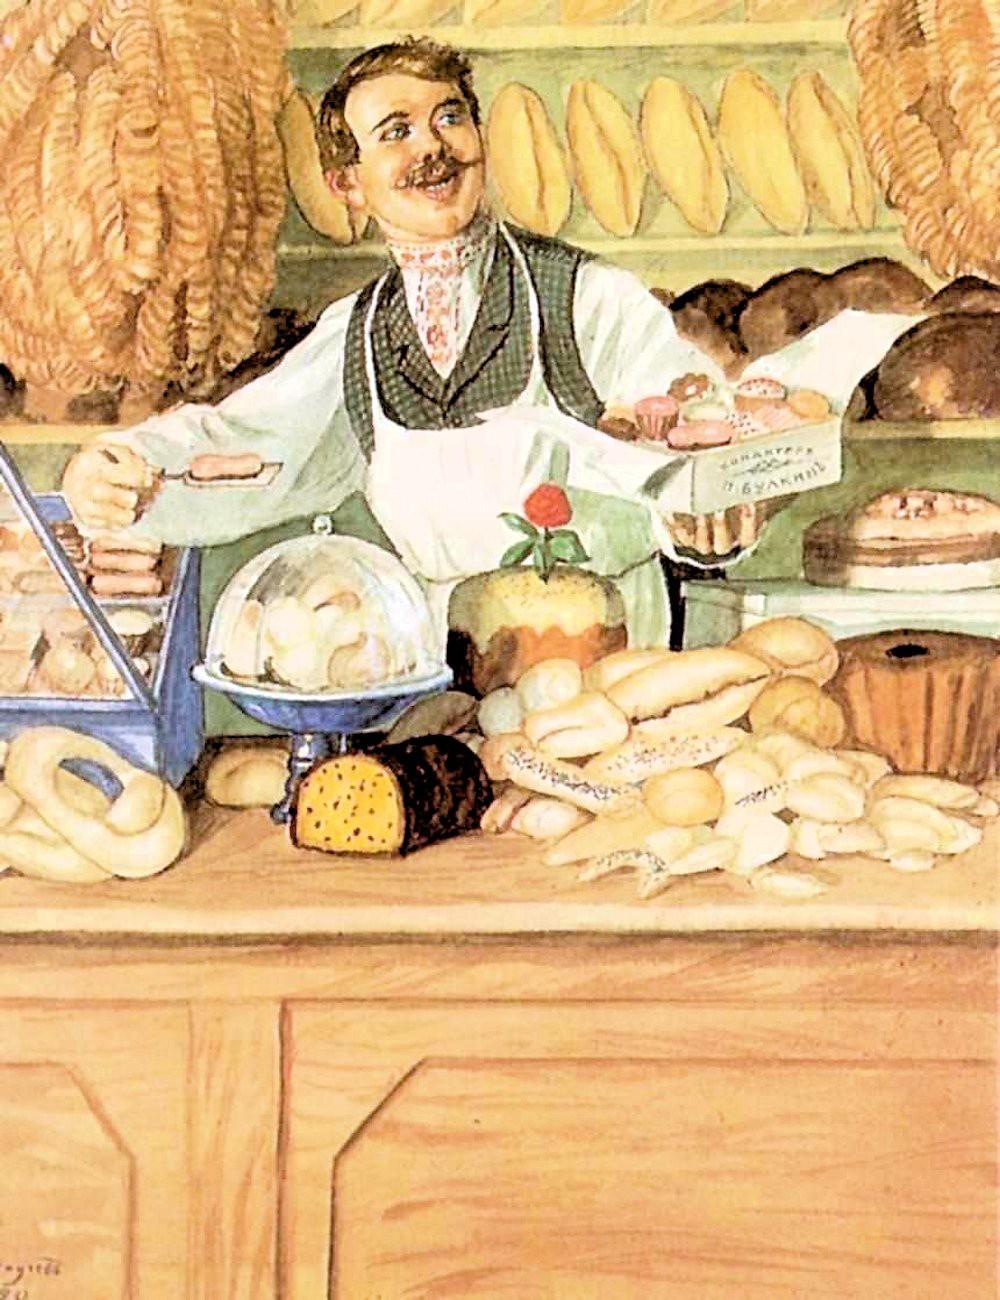 Boris Kustodiev. A Baker. 1920